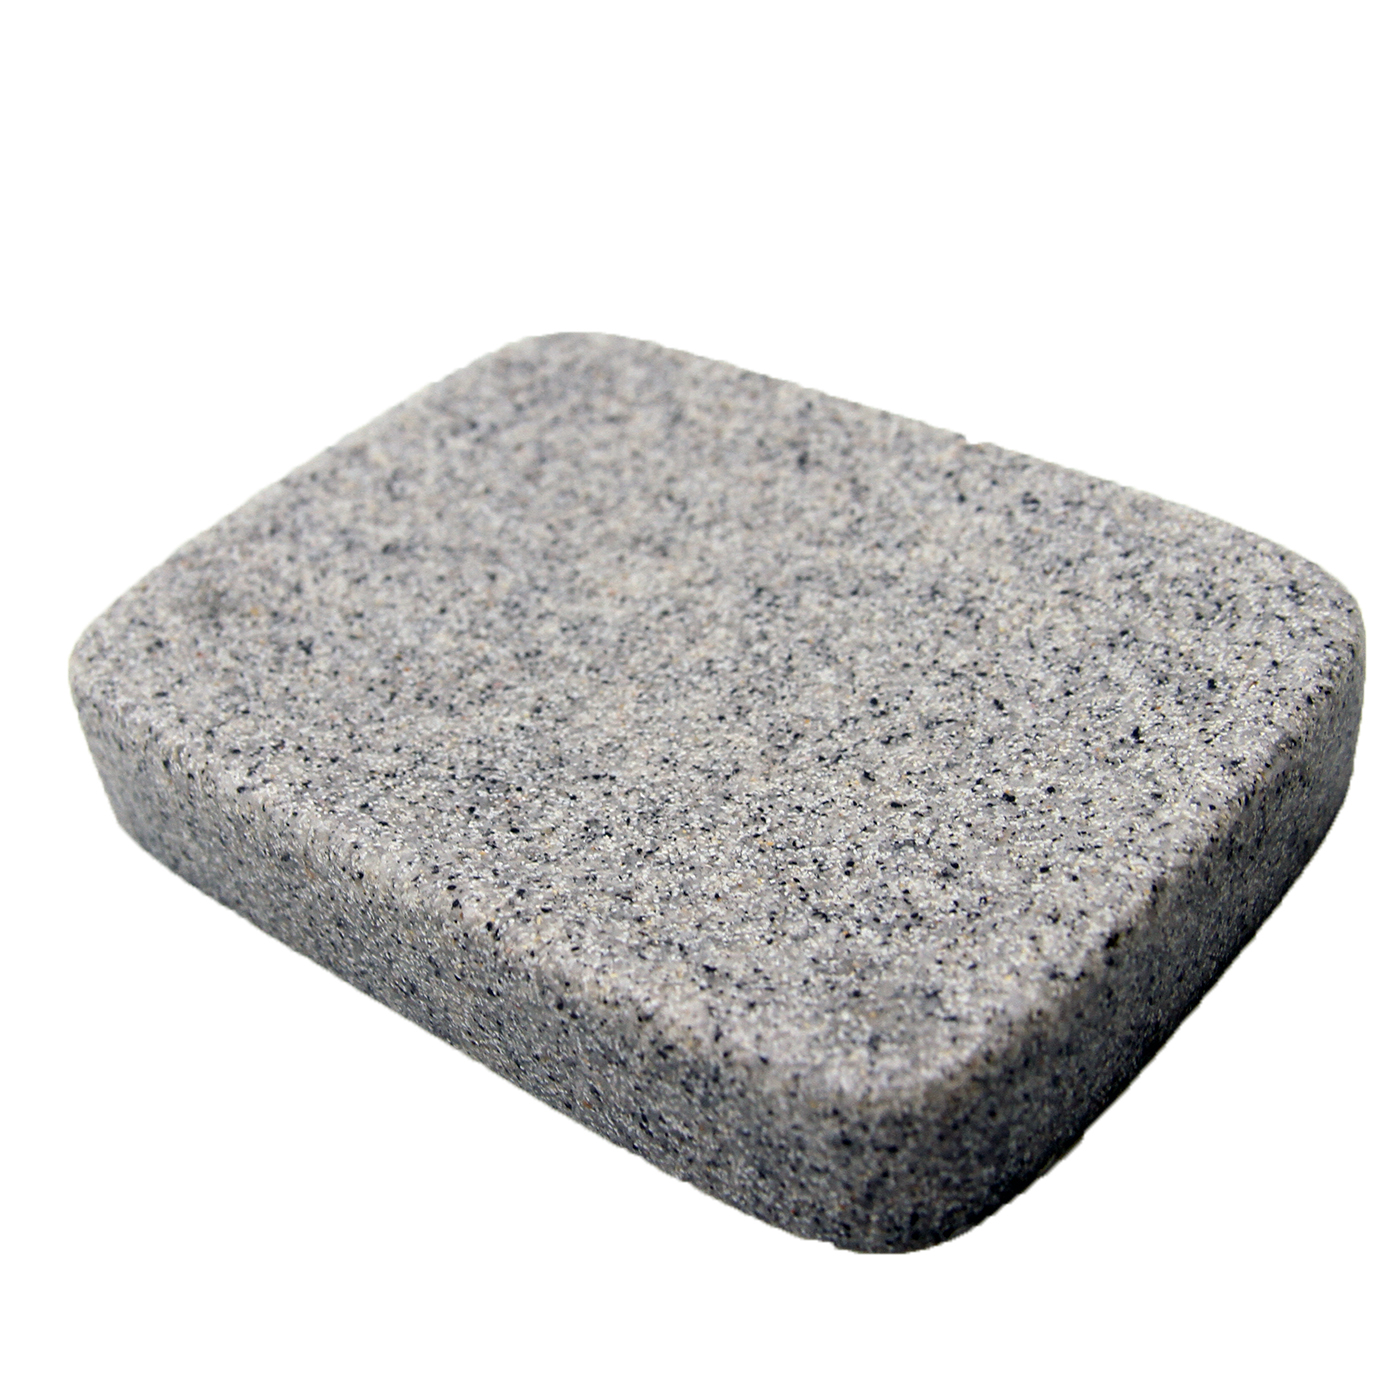 Granite Collection Dolomite Soap Dish Holder Gray Shower Sink Bathroom Walmart Com Walmart Com